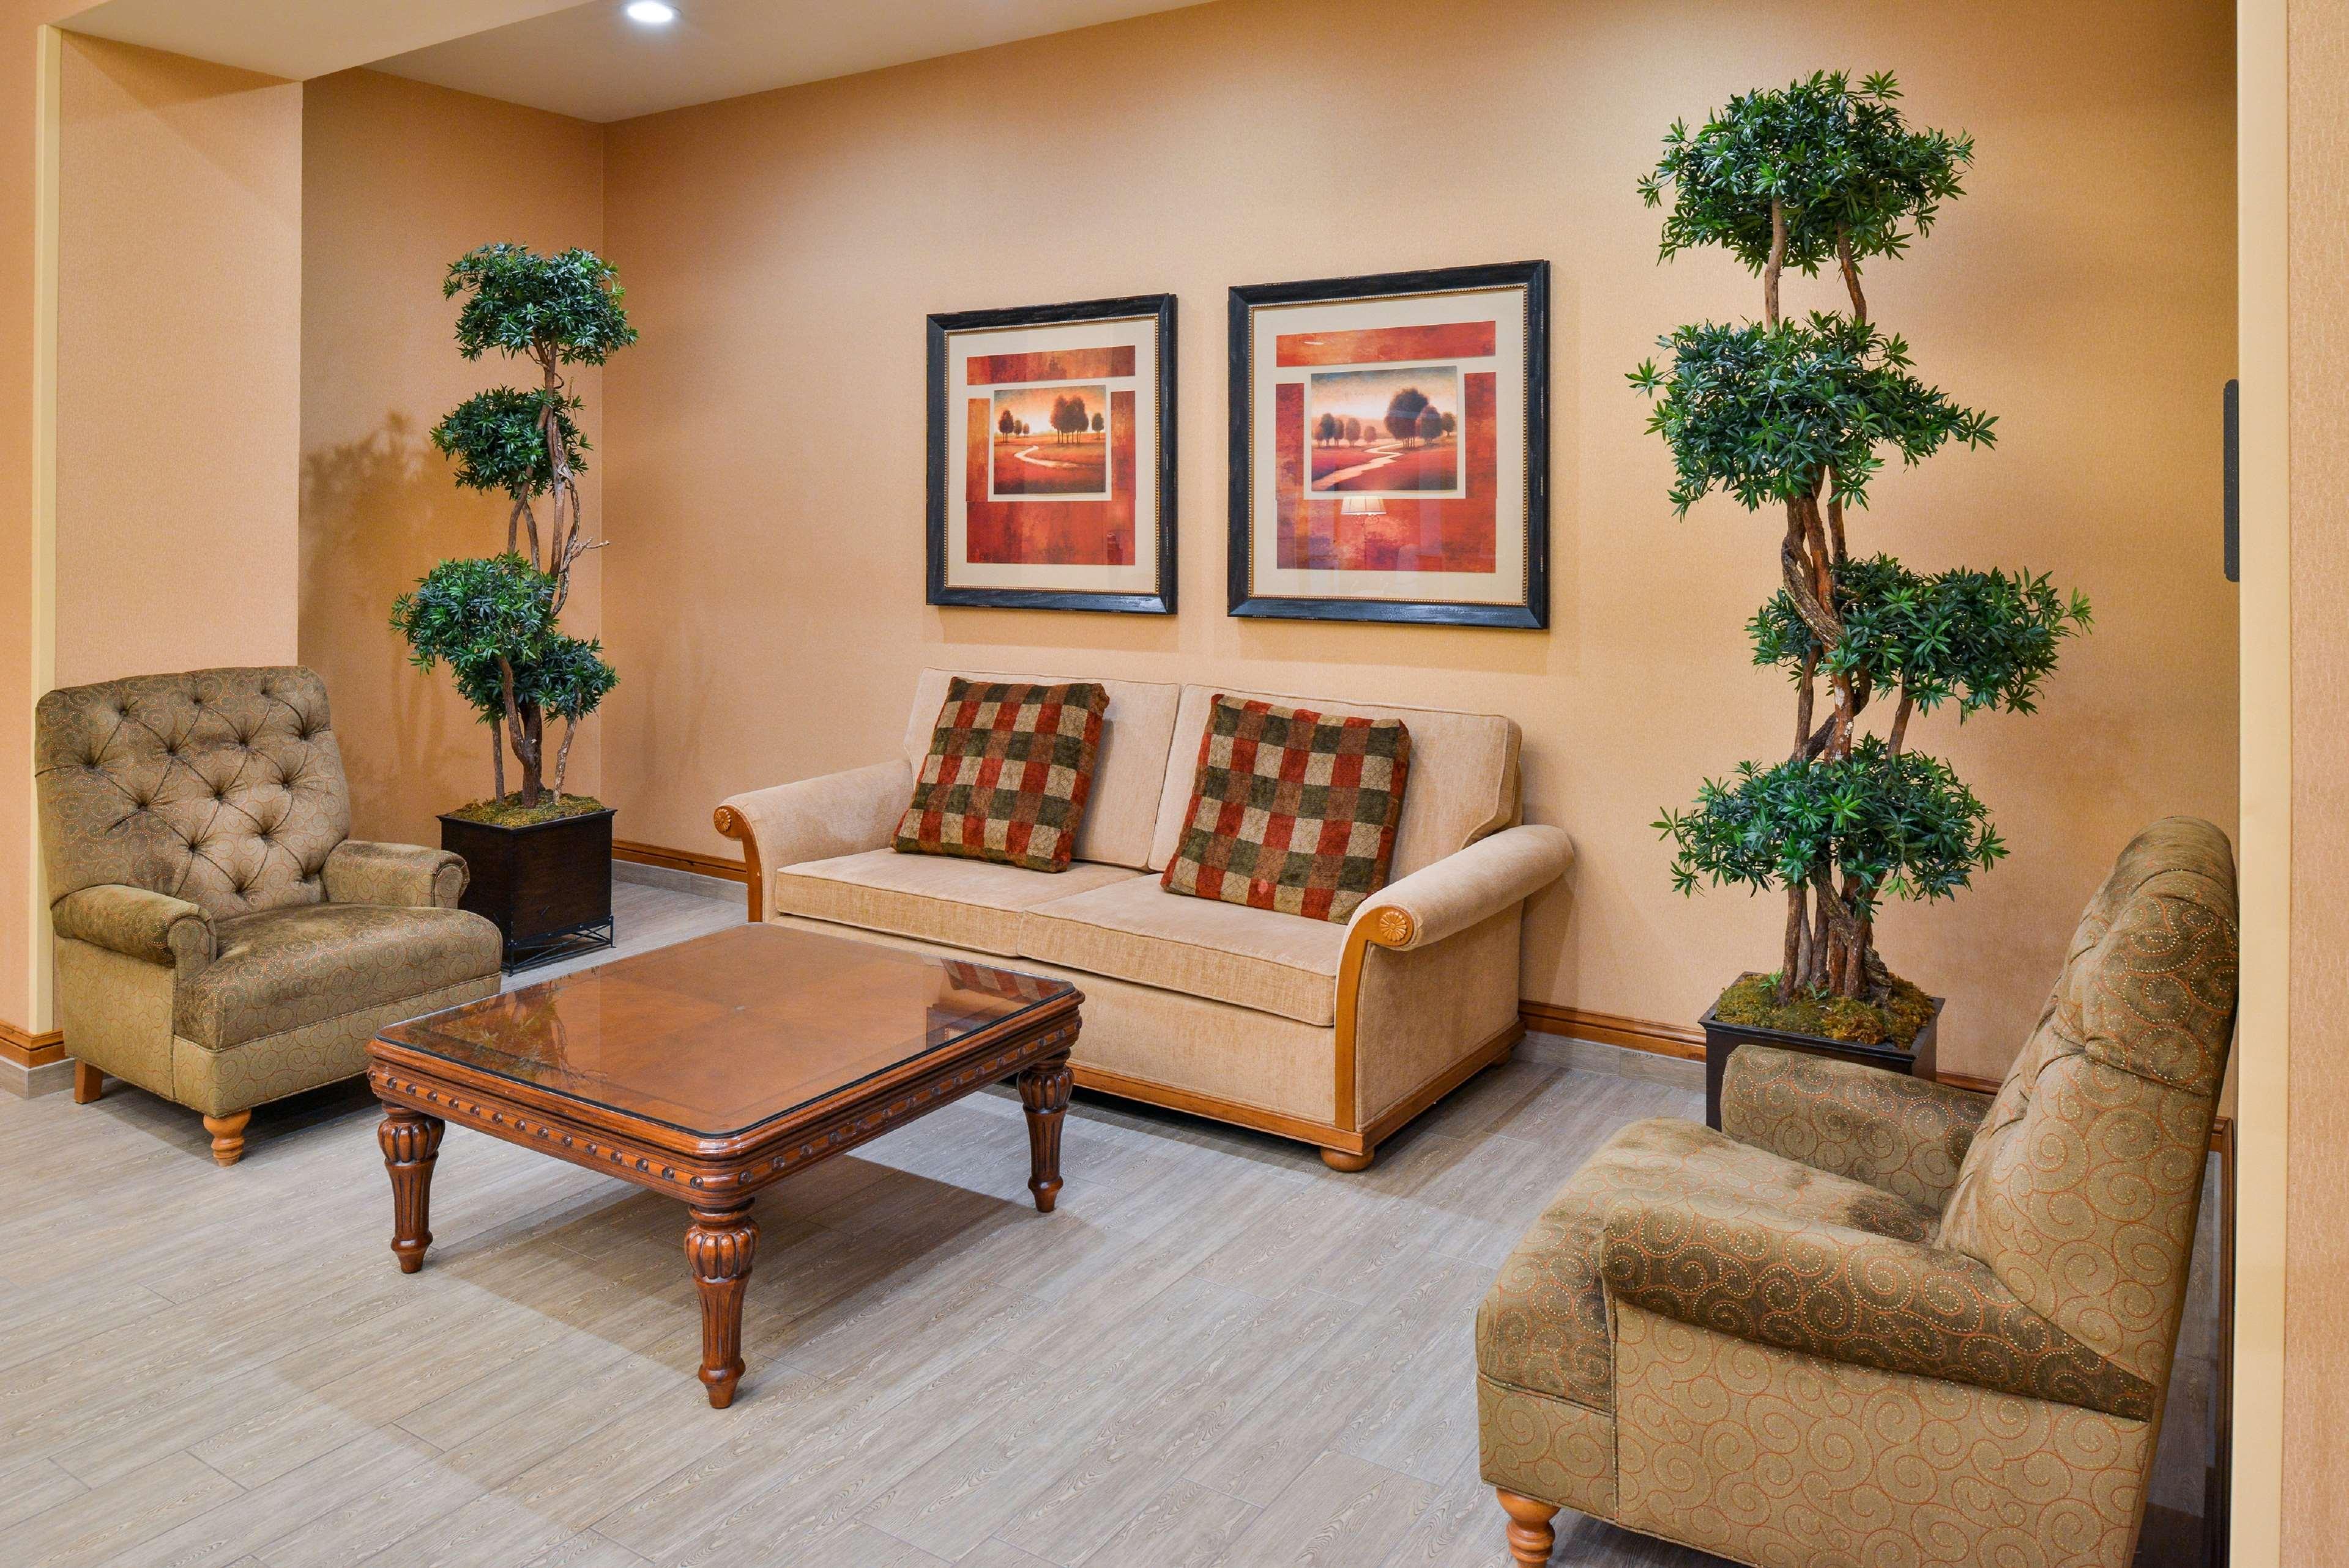 Hampton Inn & Suites Coeur d' Alene image 26